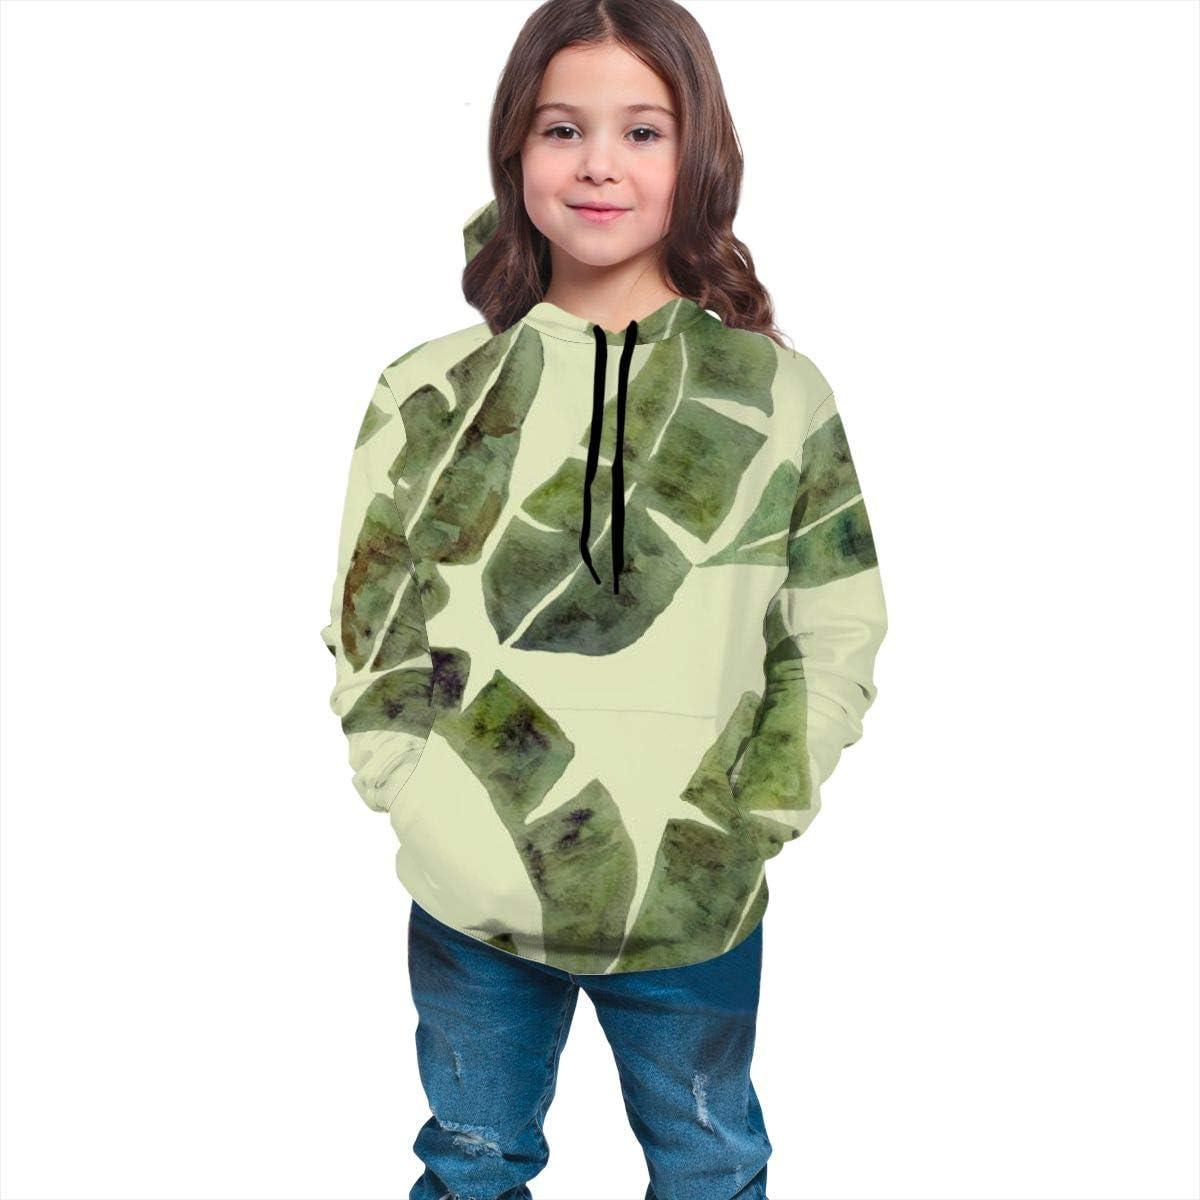 Kjiurhfyheuij Teens Pullover Hoodies with Pocket Banana Tree Leaves Fleece Hooded Sweatshirt for Youth Kids Boys Girls